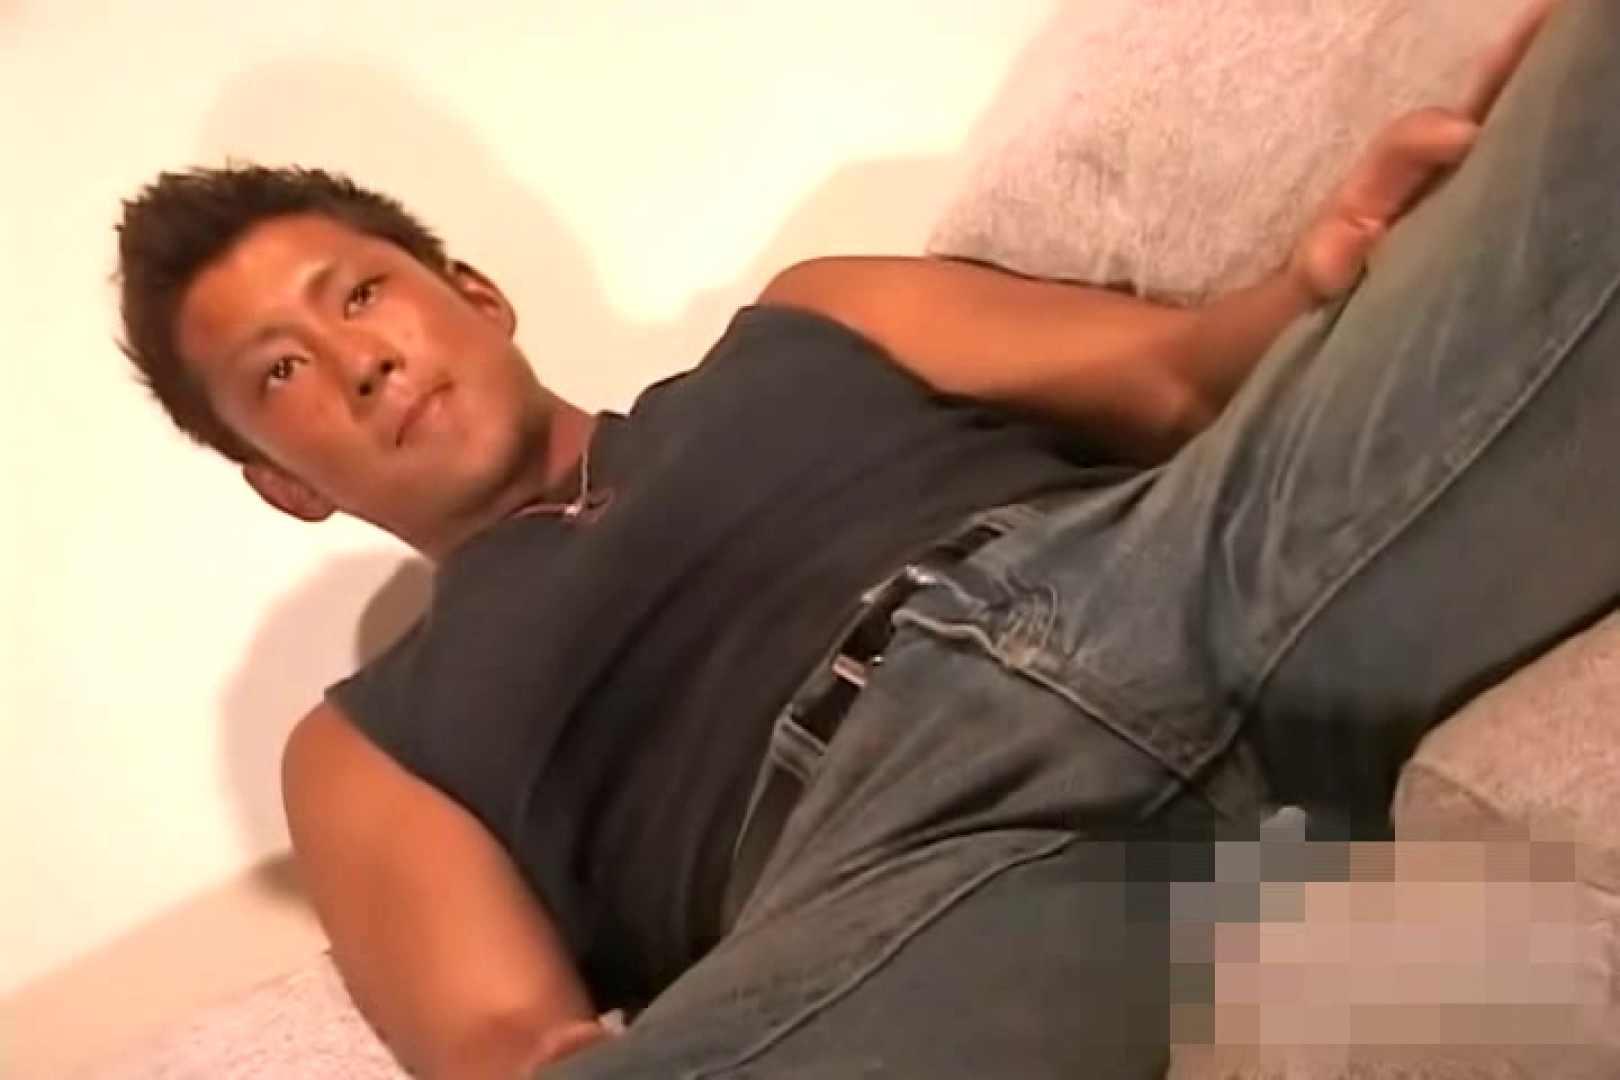 Beautiful muscle モッコリ野郎達!Vol.02 イケメンのsex | スリム美少年系ジャニ系  80pic 16